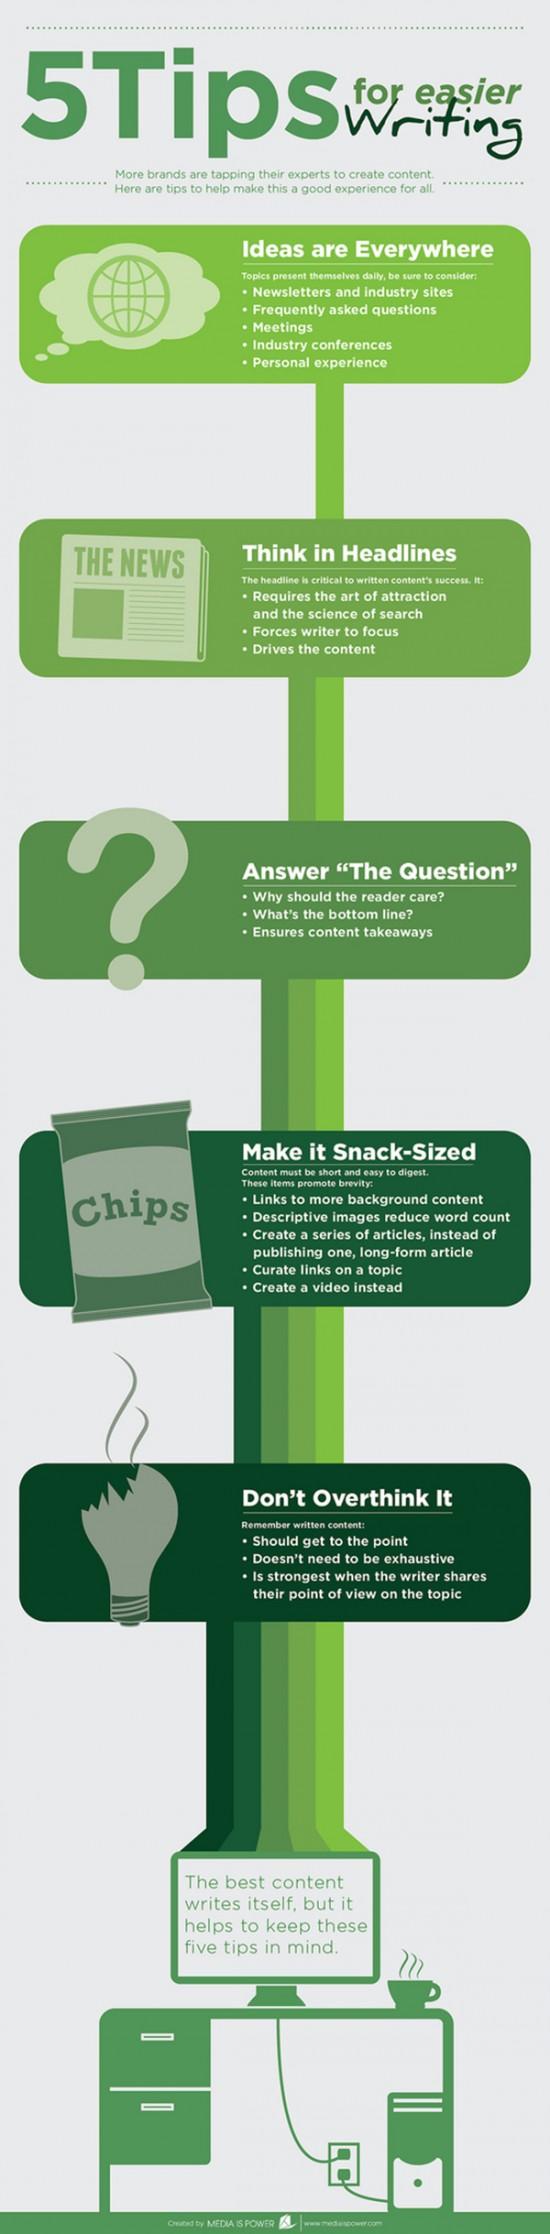 5 tipu pro jednodussi psani - infografika